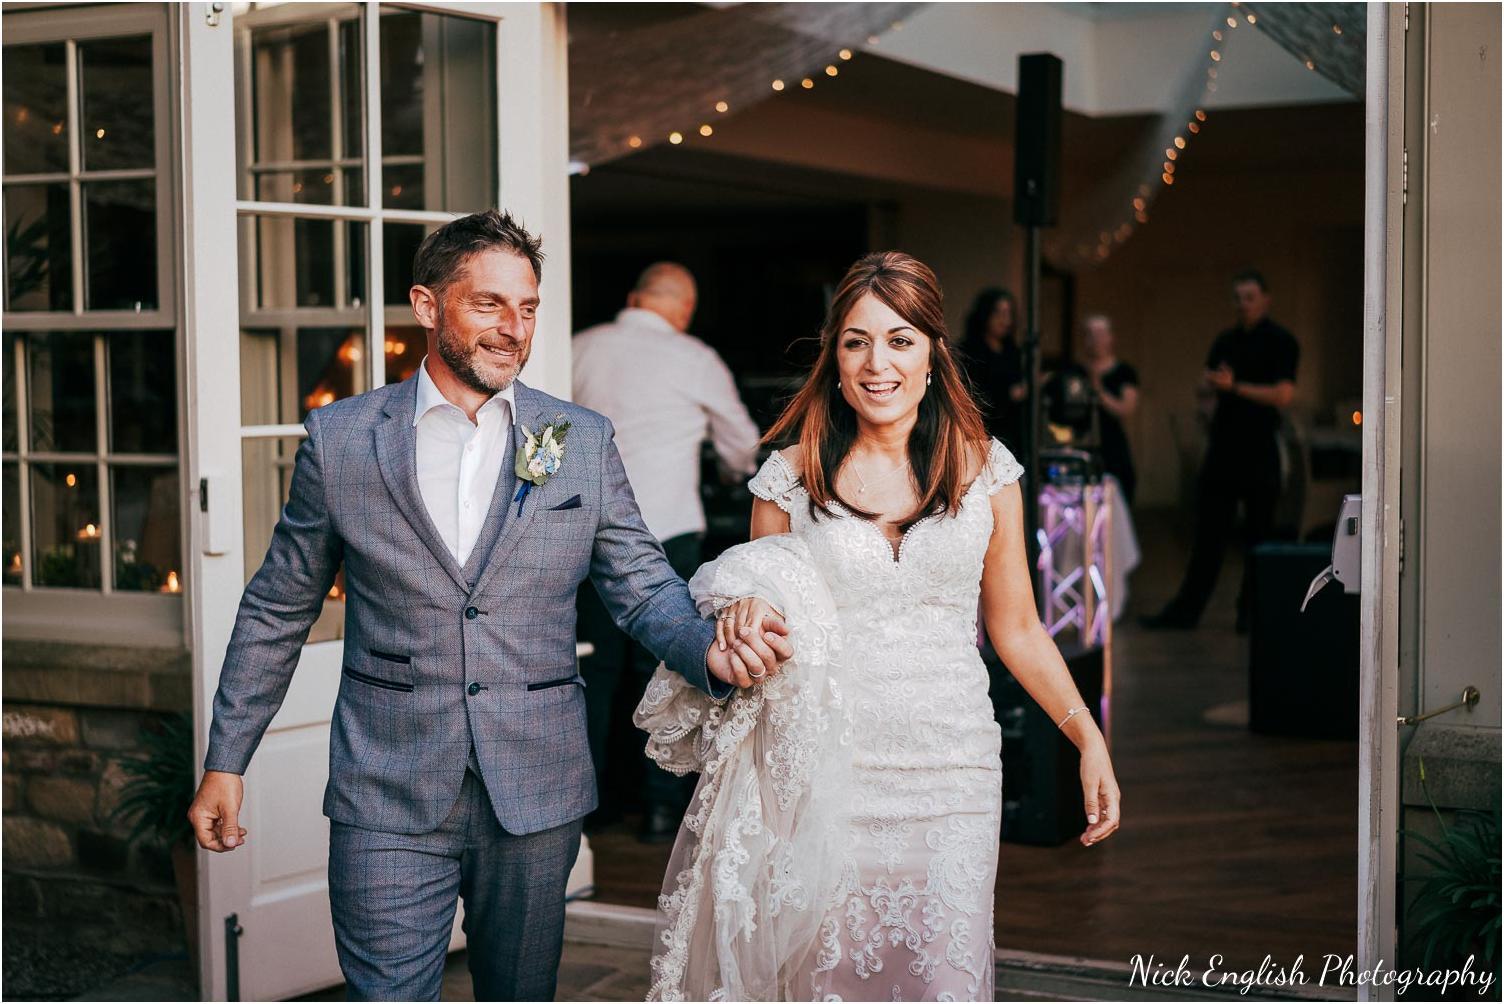 Mitton_Hall_Wedding_Photographer-105.jpg